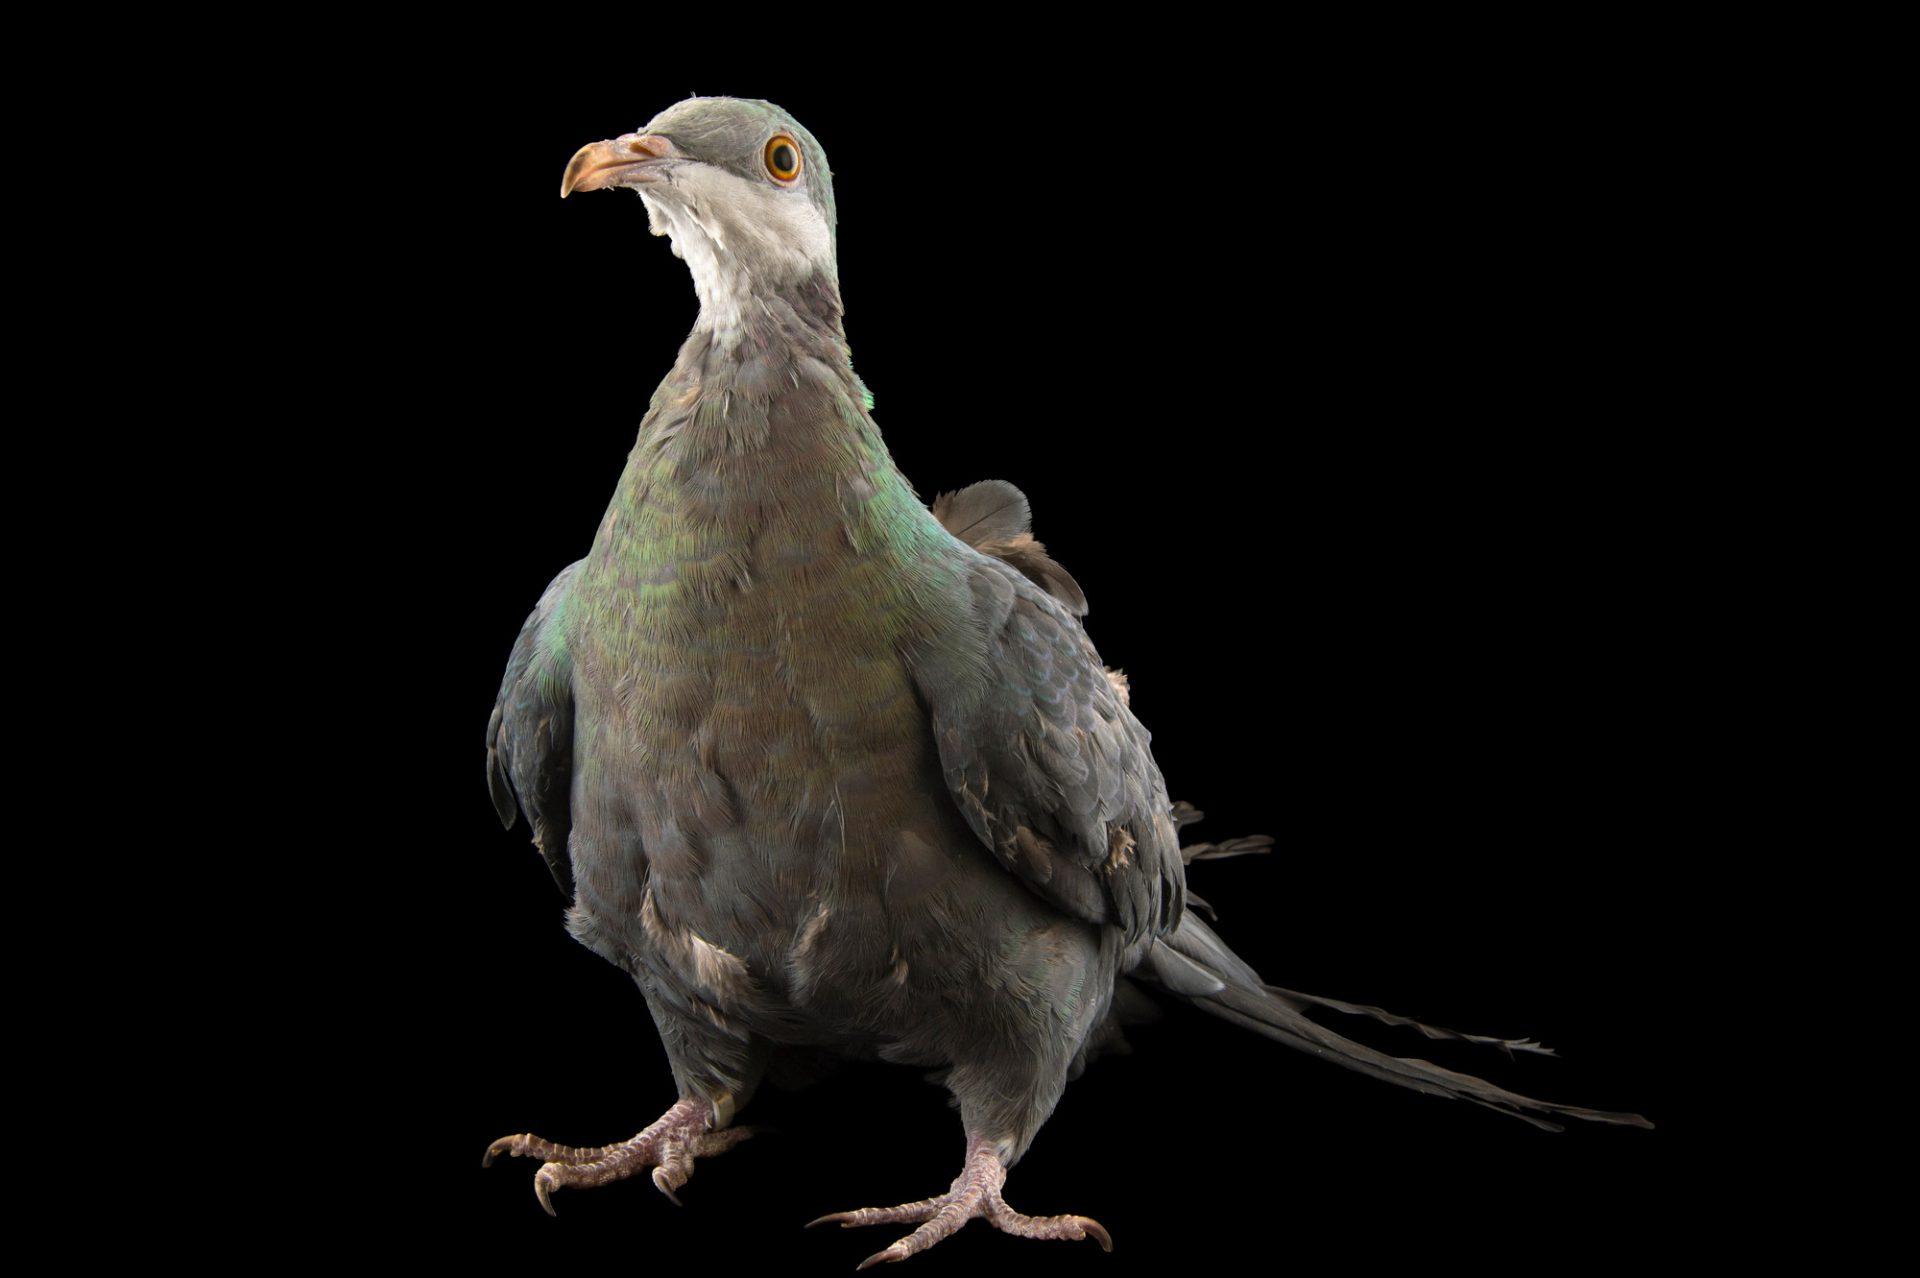 Photo: A metallic pigeon (Columba vitiensis griseogularis) at the Plzen Zoo in the Czech Republic.